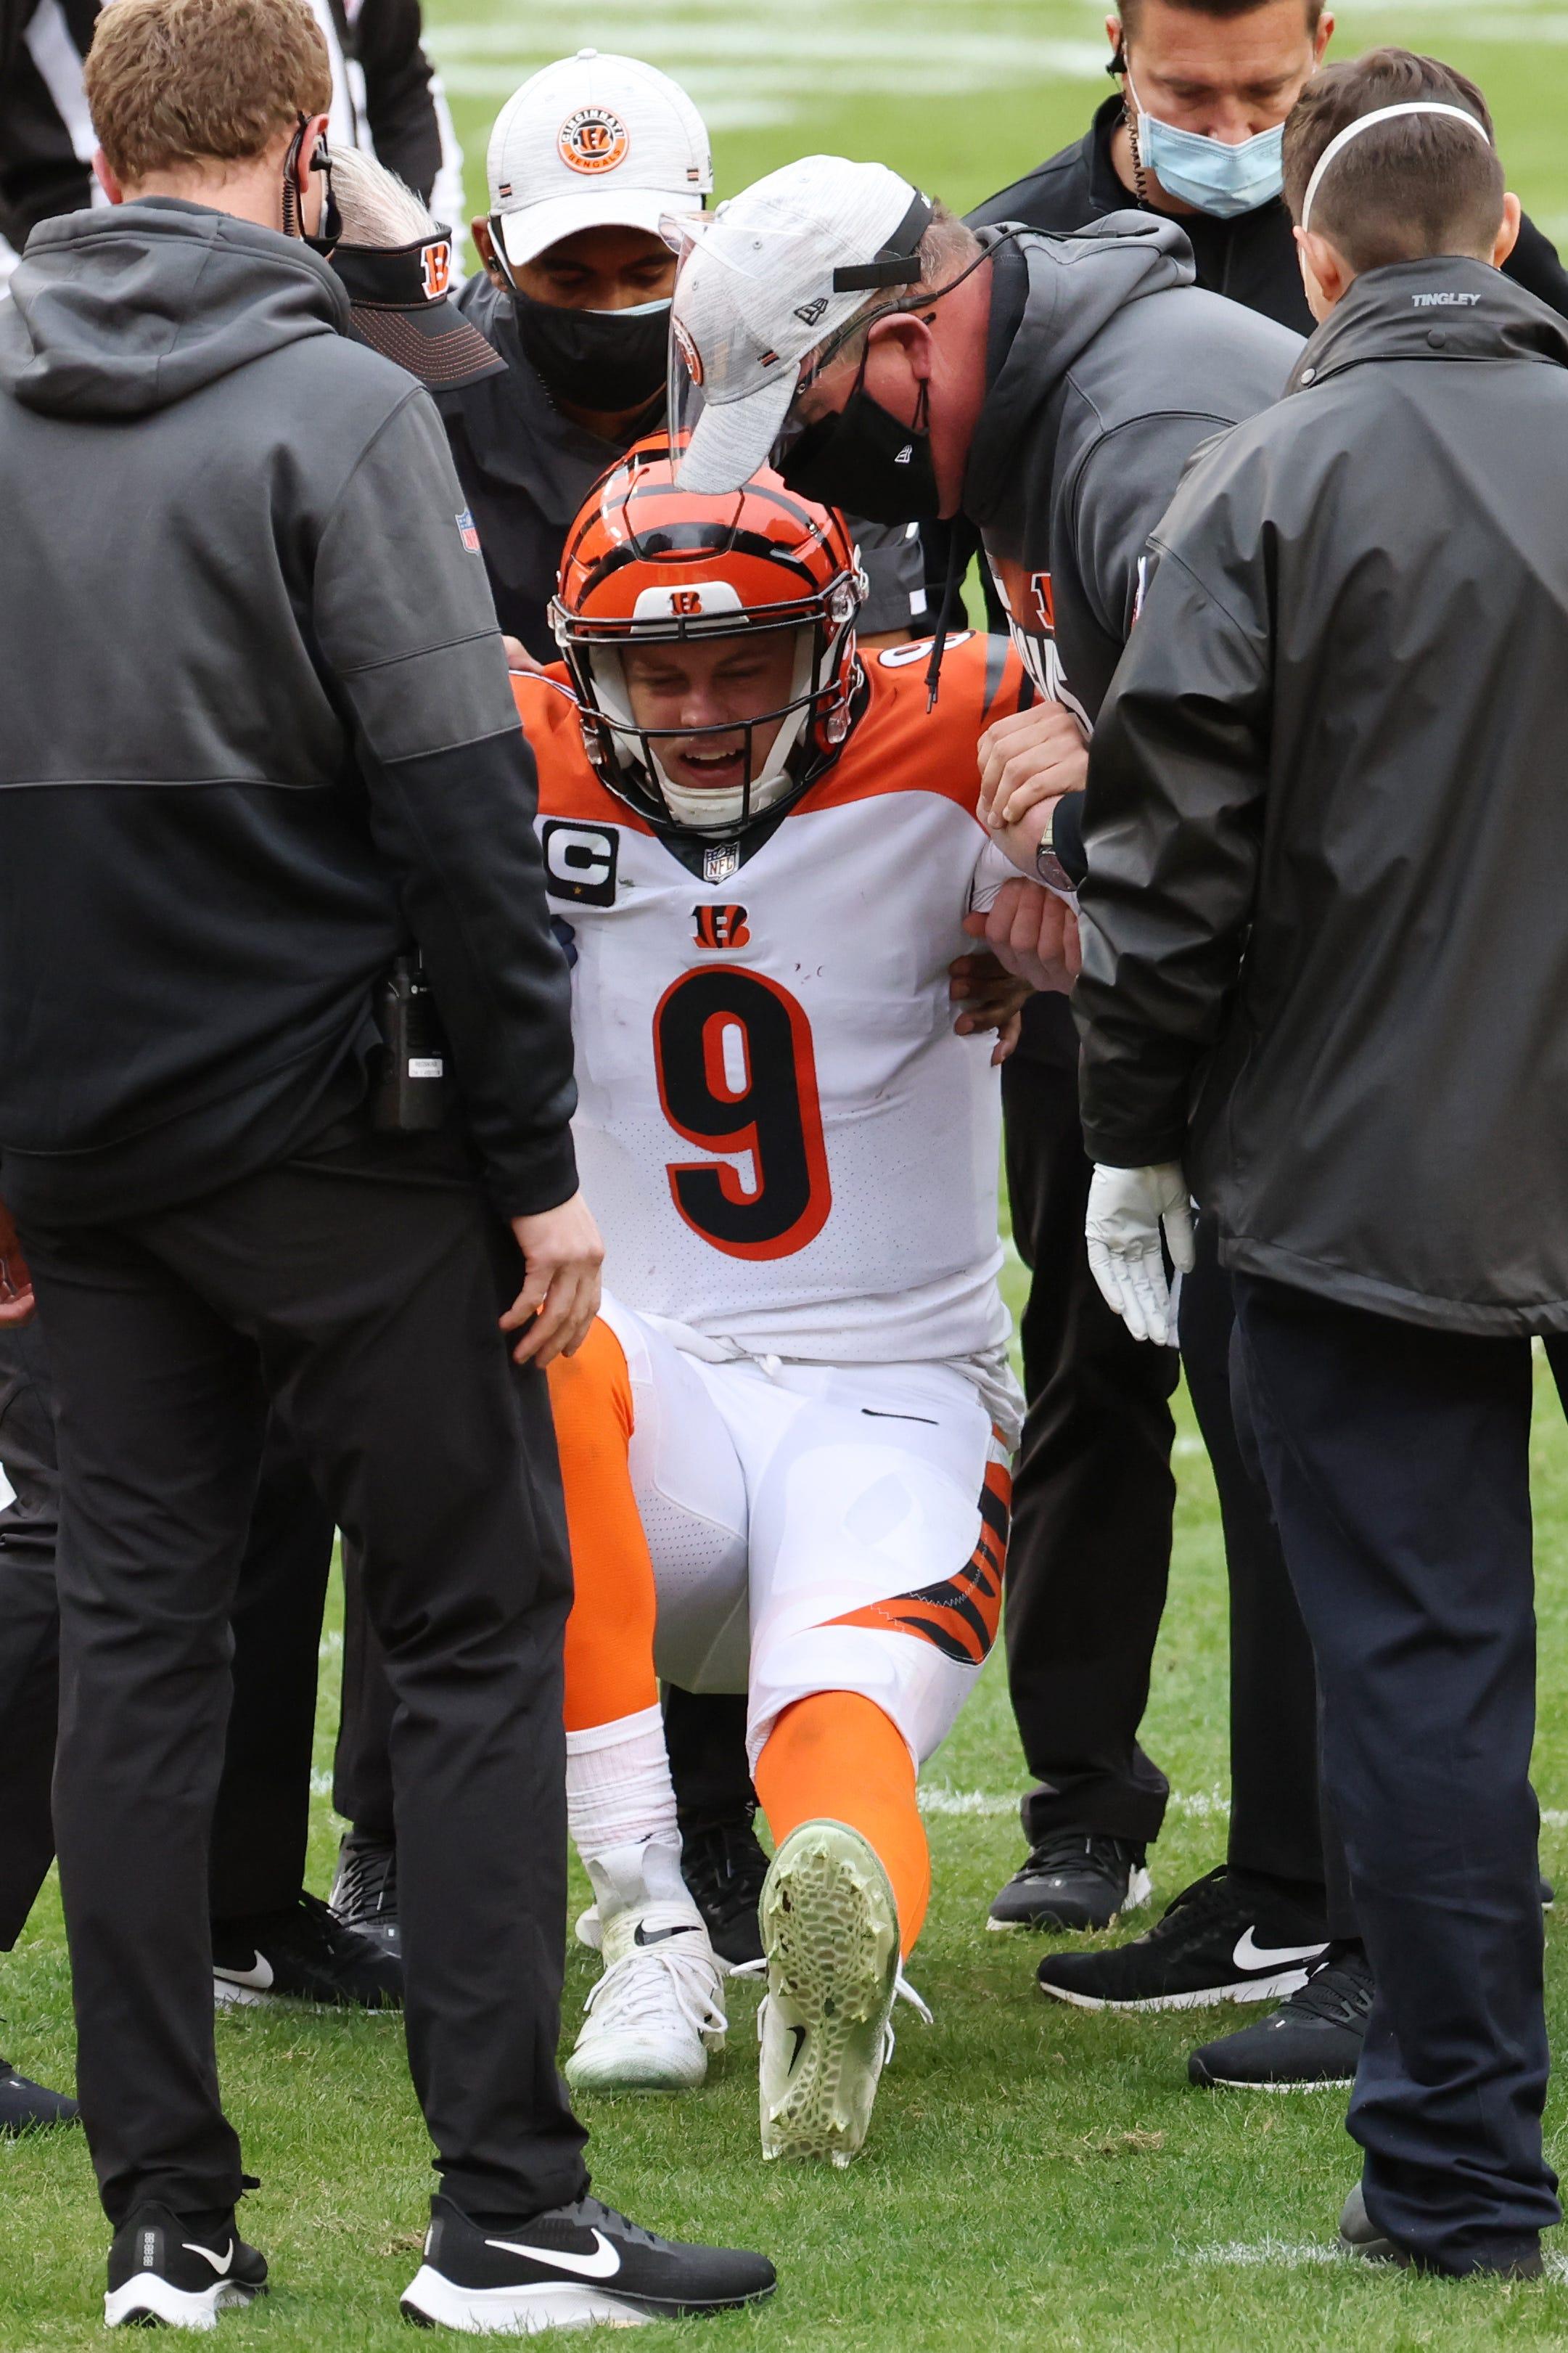 Opinion: The Cincinnati Bengals owe quarterback Joe Burrow better than this